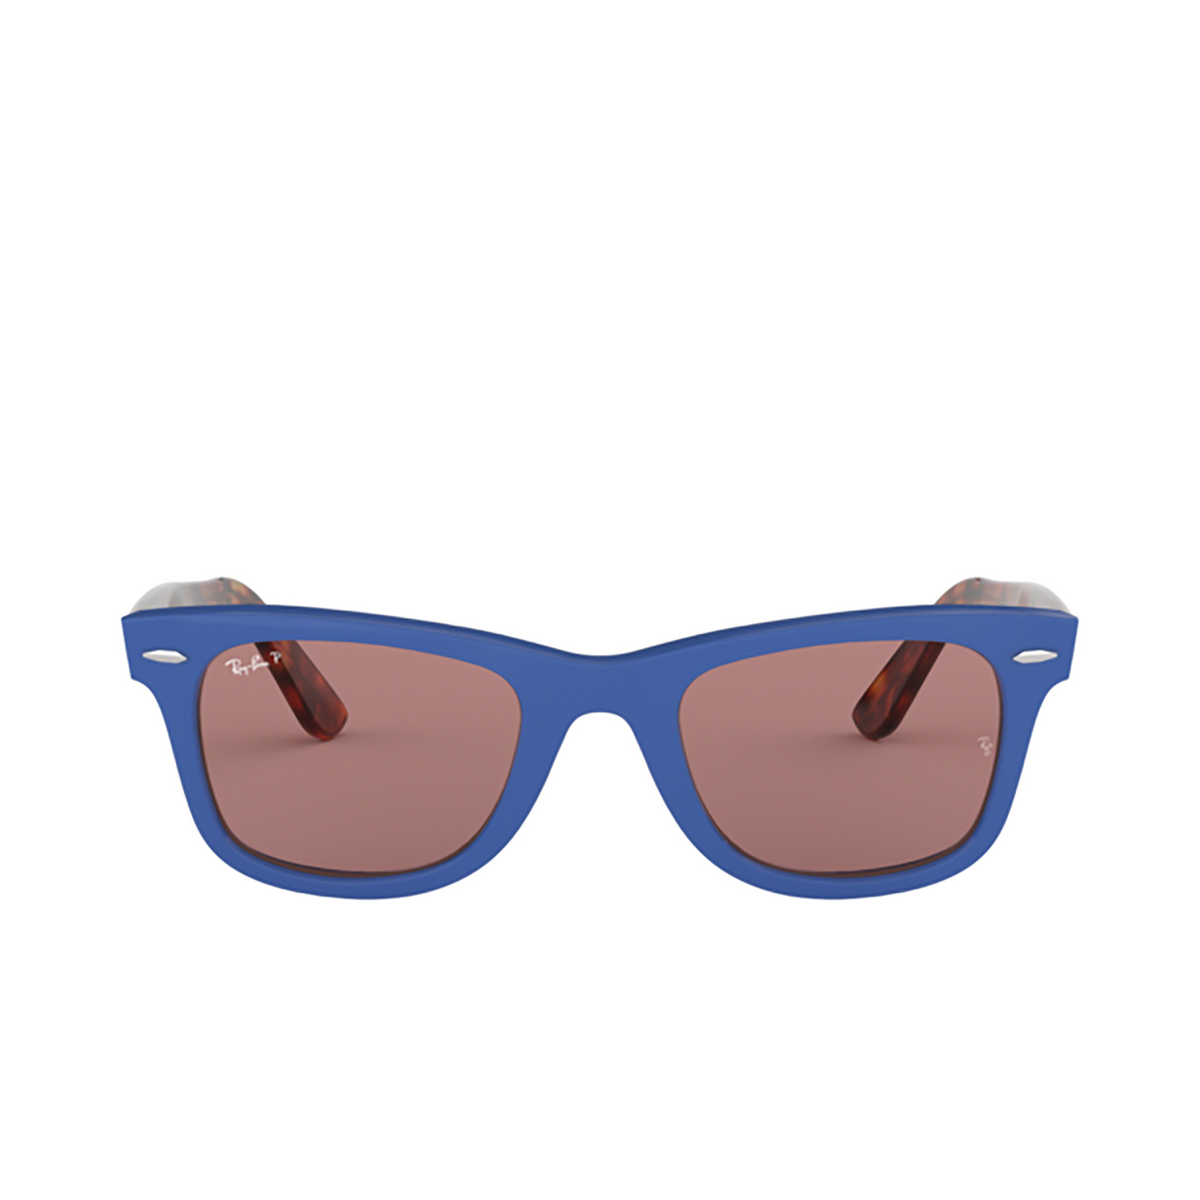 Ray-Ban® Square Sunglasses: Wayfarer RB2140 color Blue 1241W0.